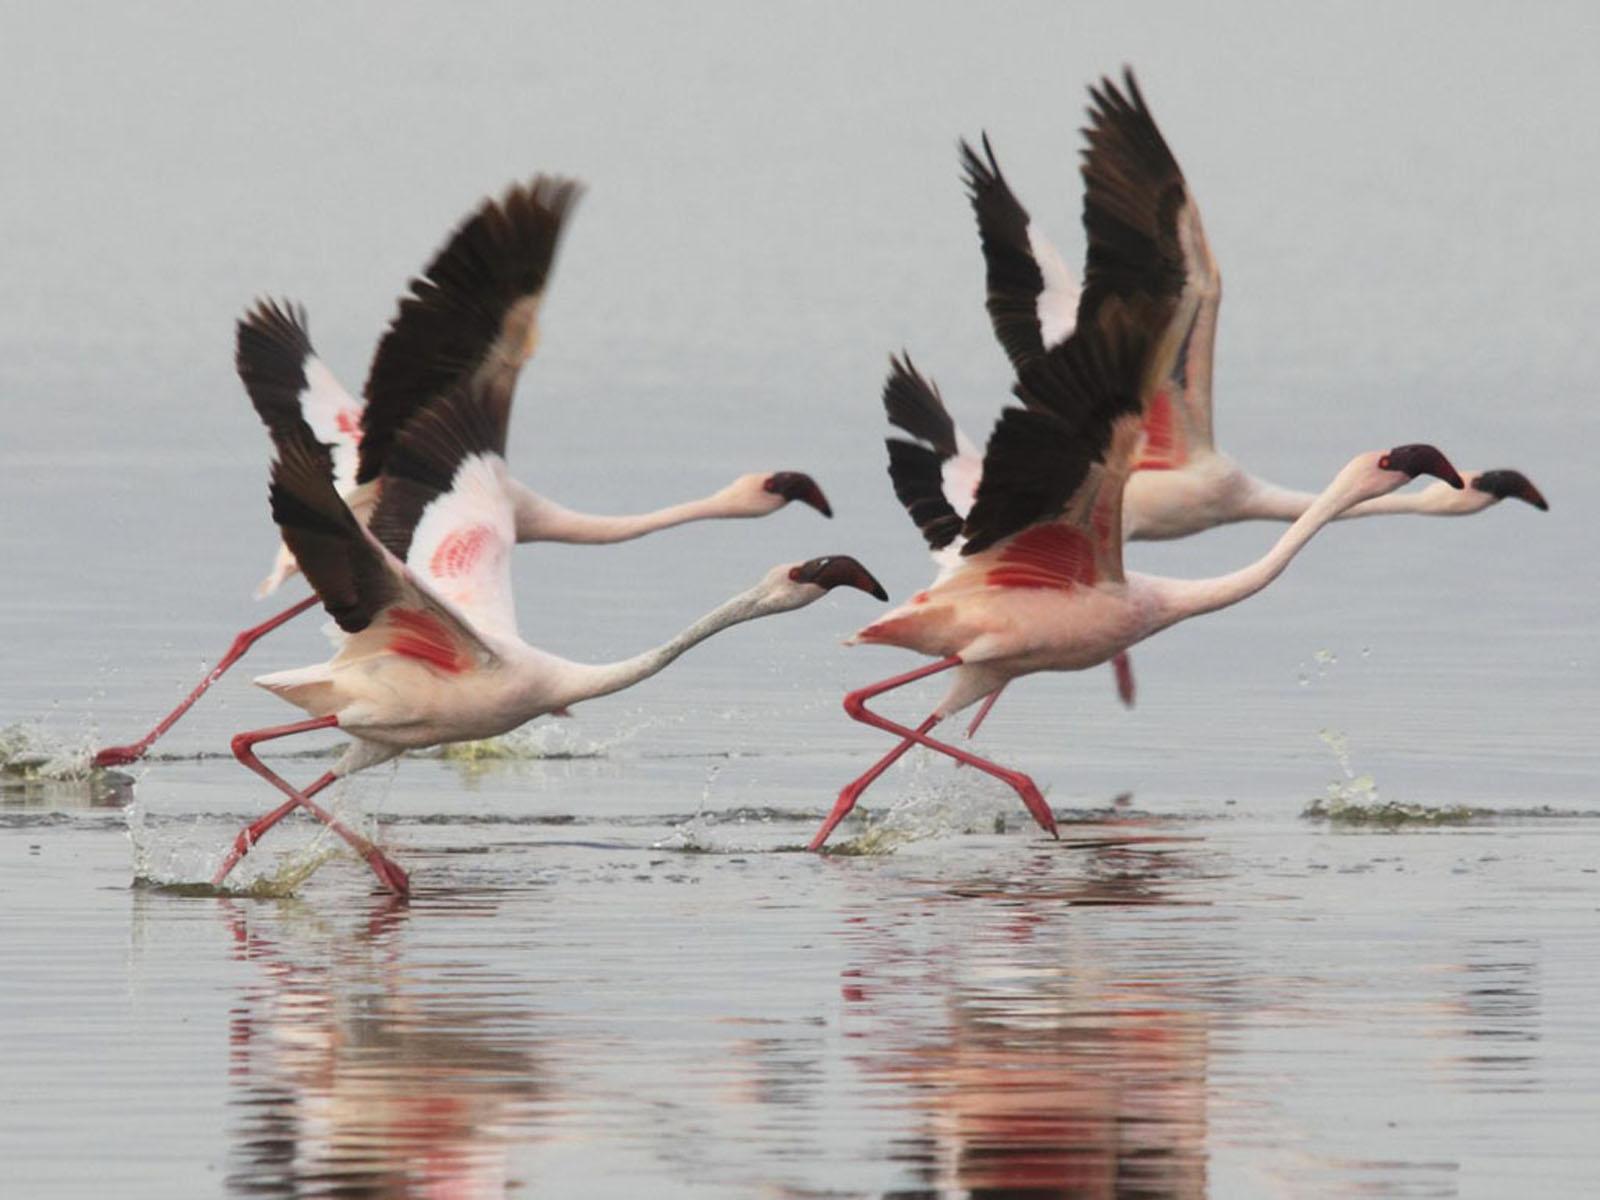 Keywords Flamingo Wallpapers Flamingo DesktopWallpapers Flamingo 1600x1200